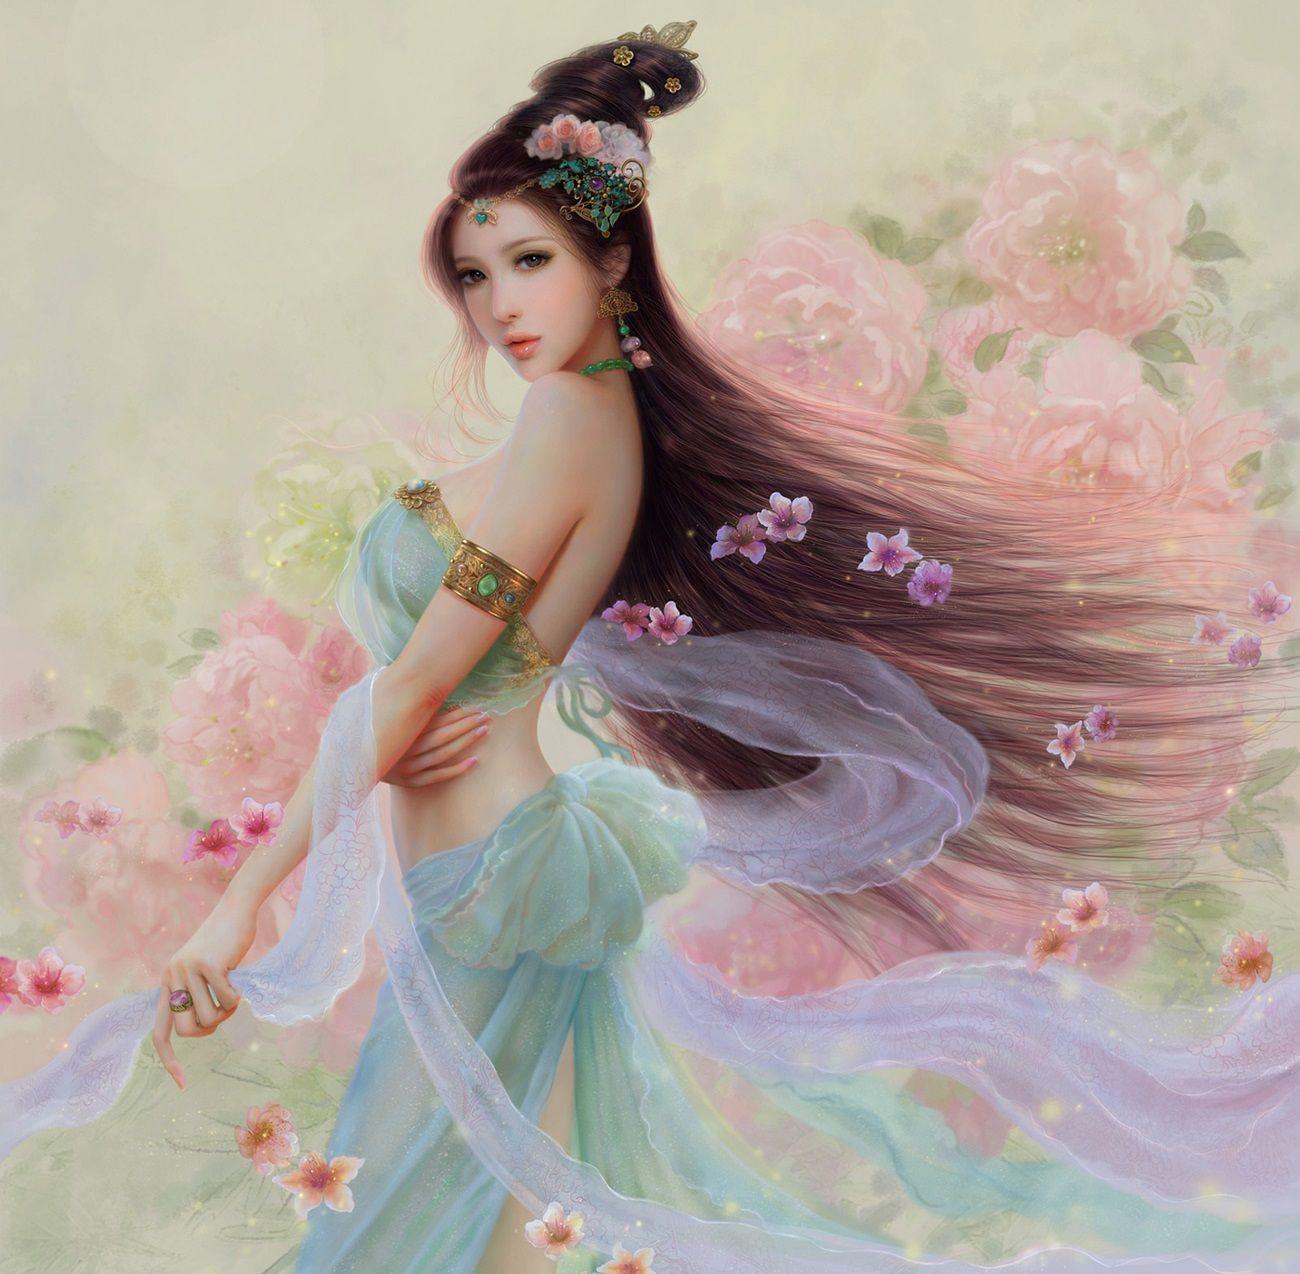 Asian girls fantasy most beautiful